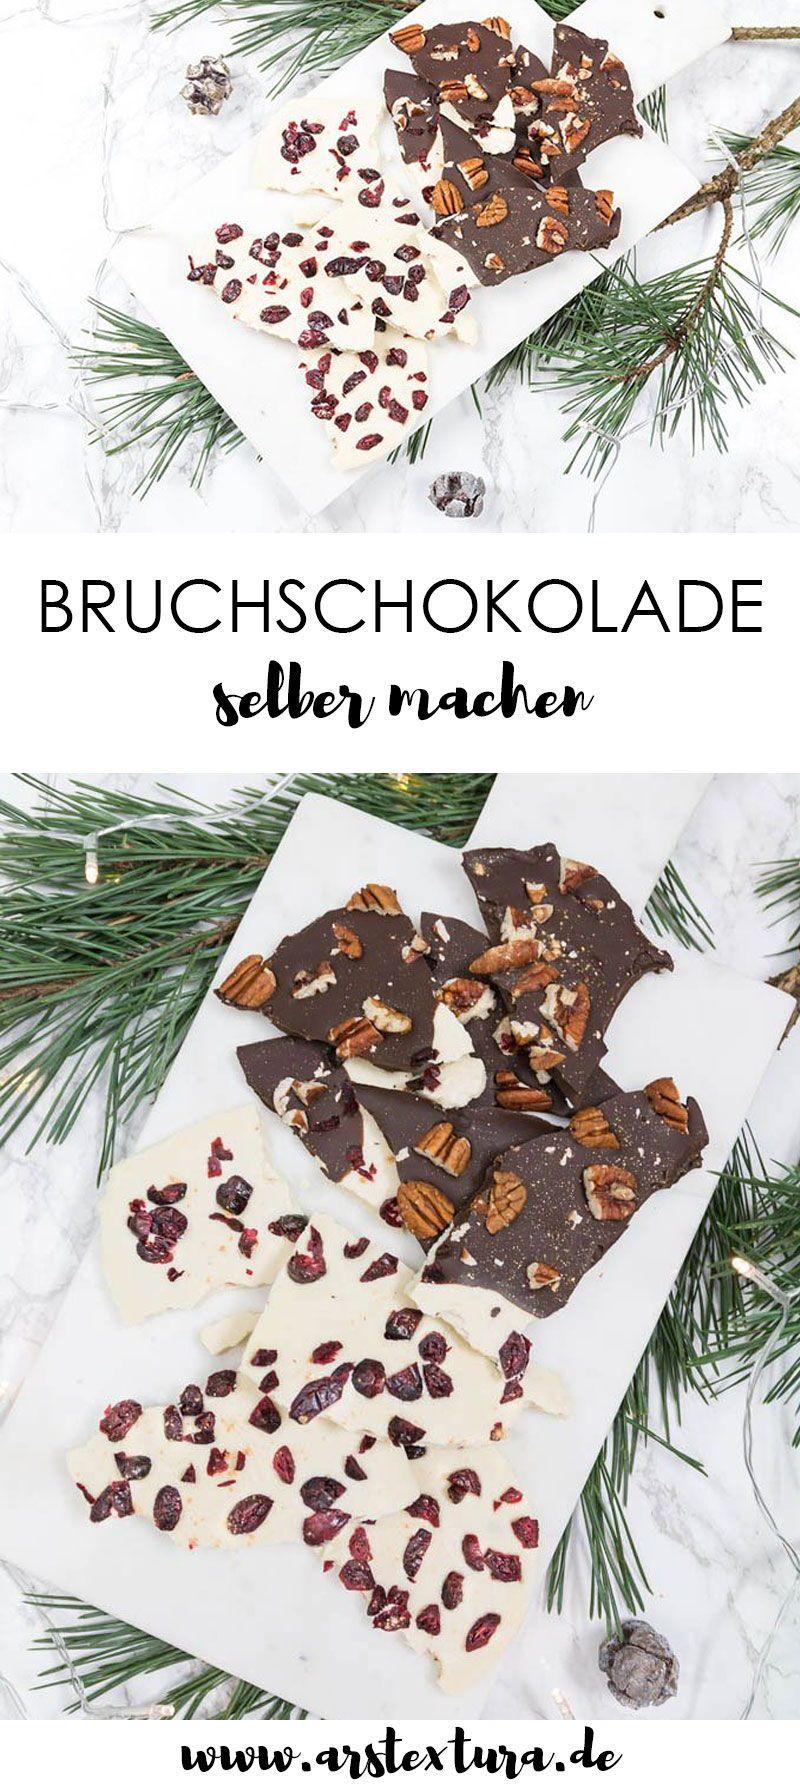 DIY Schokolade selber machen – DIY Geschenk | ars textura